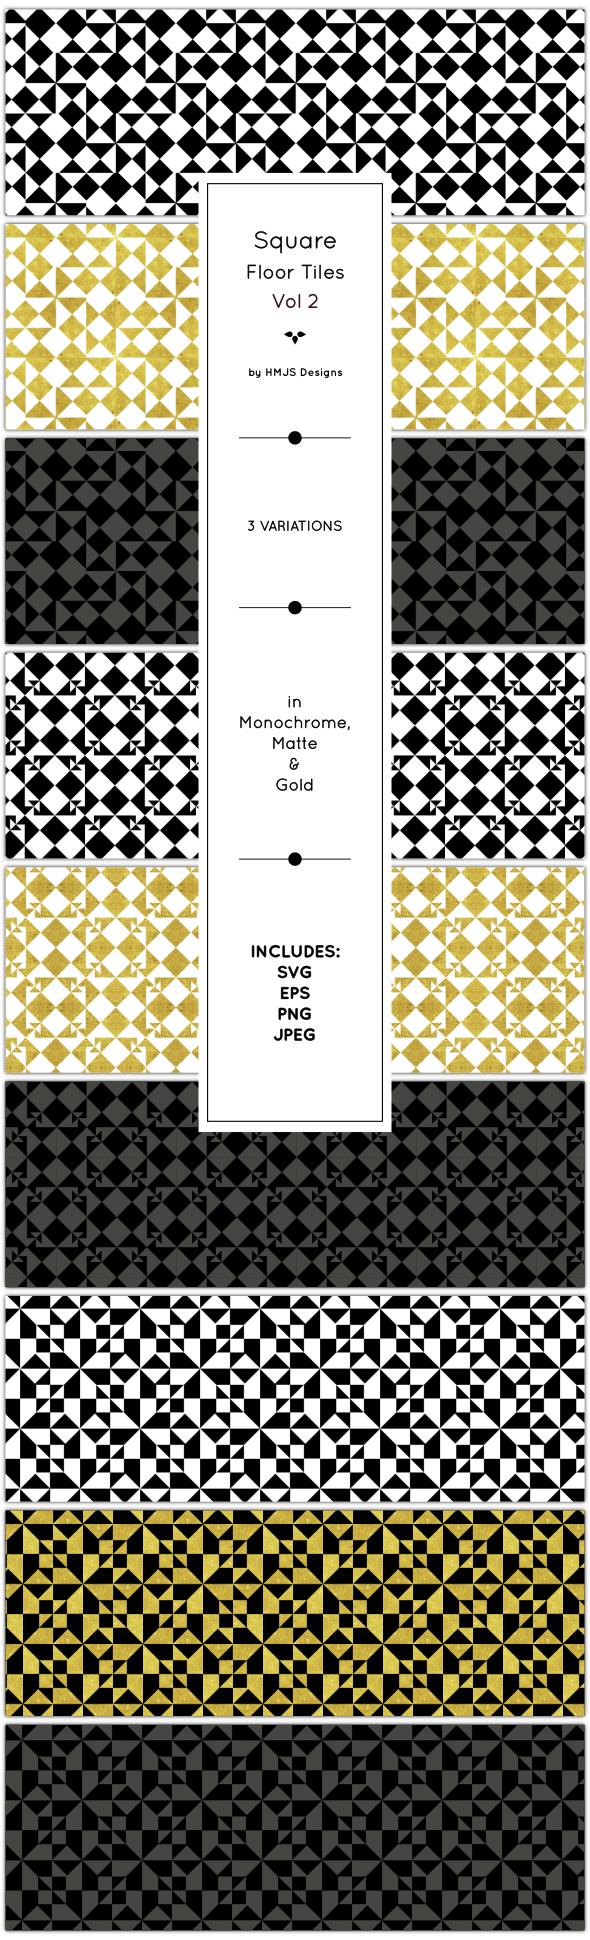 Classic Floor Tiles, Vol 2 - Textures / Fills / Patterns Illustrator